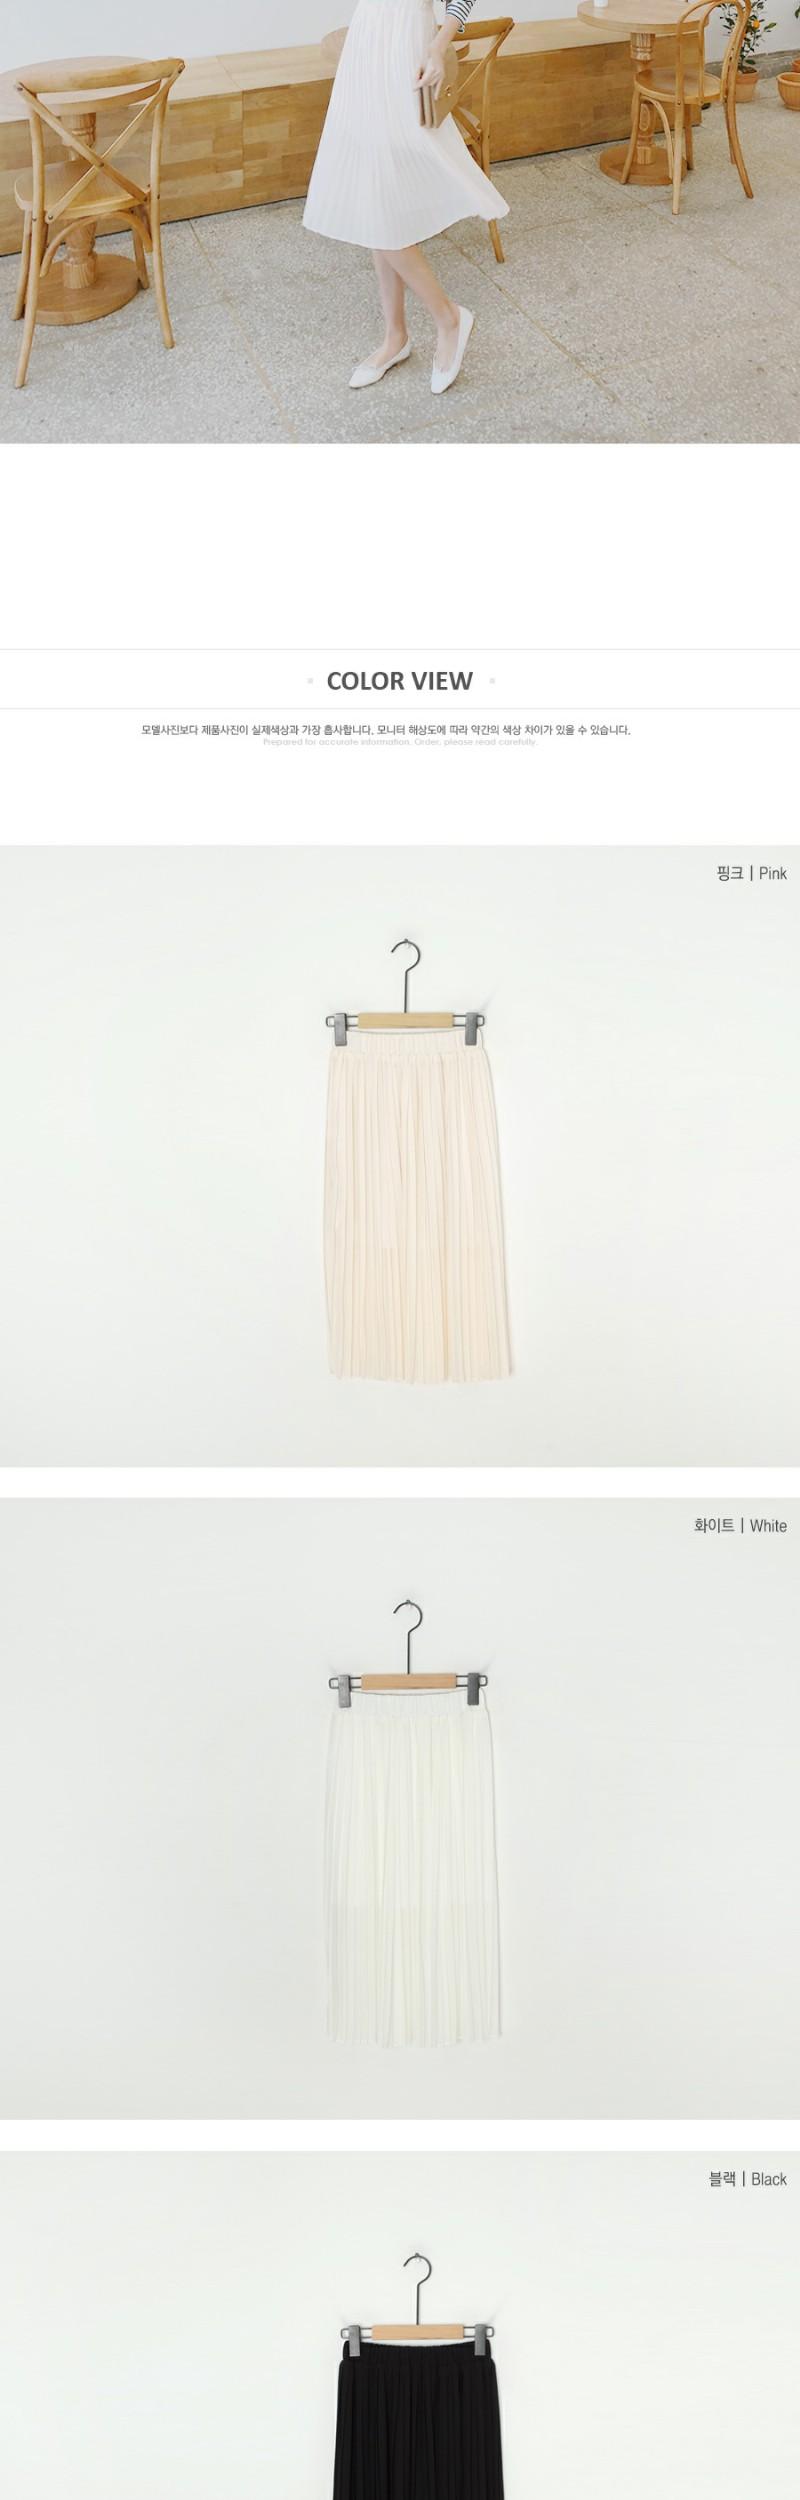 Darling pleated skirt